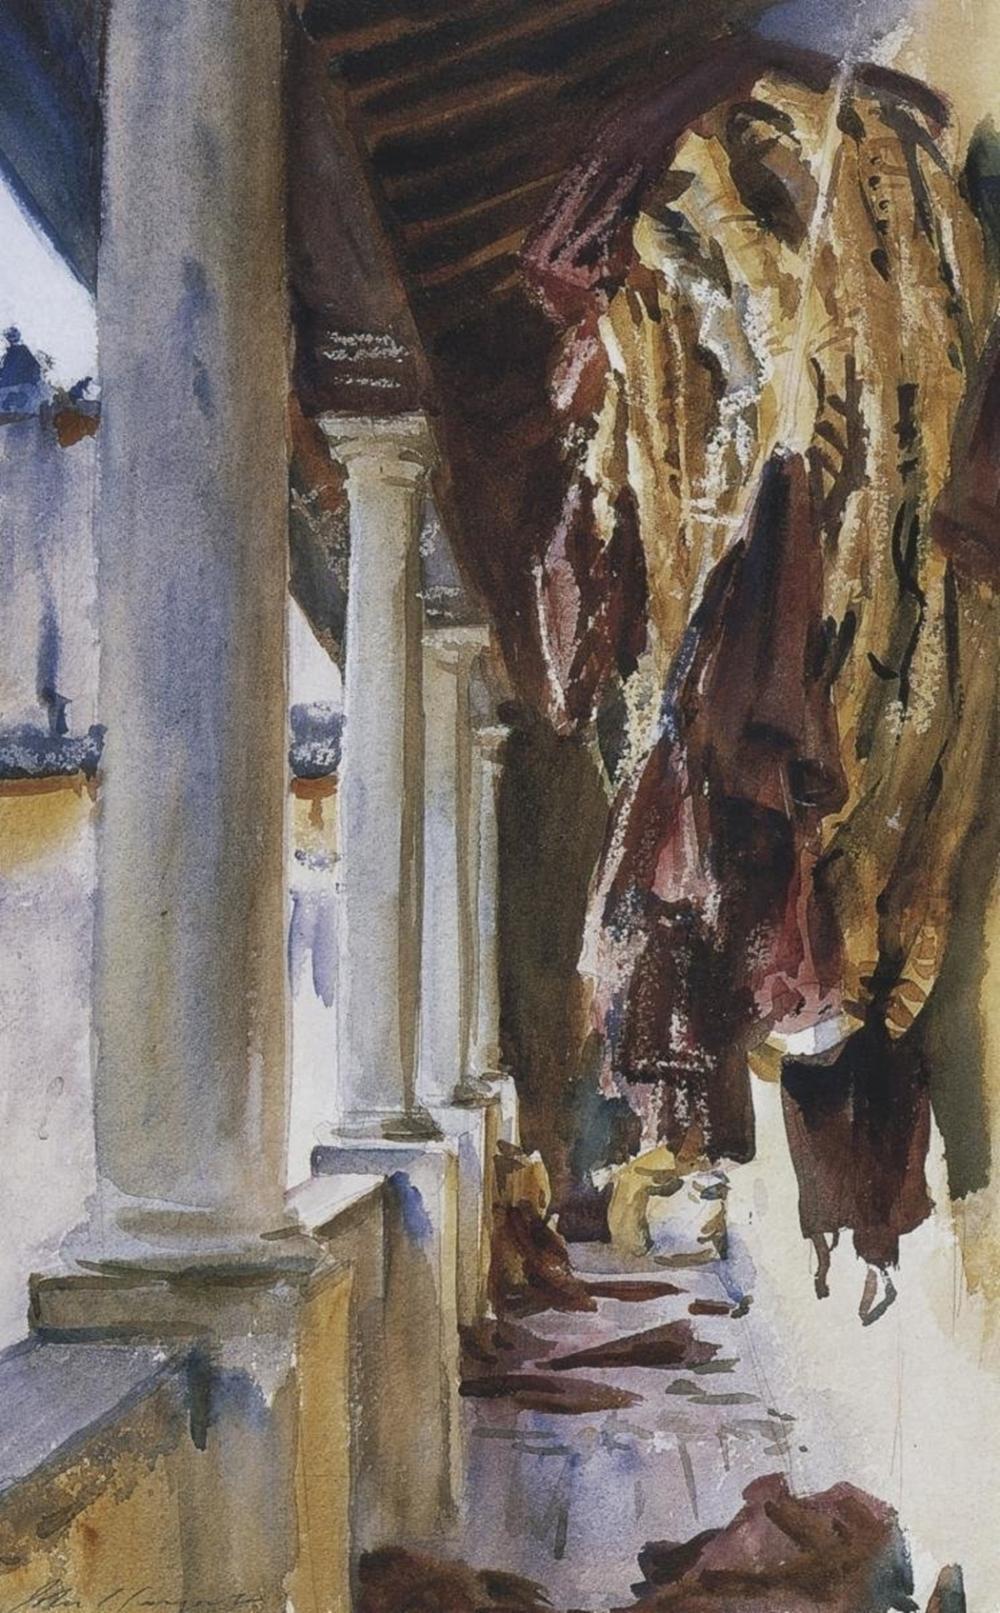 JOHN SINGER SARGENT TORRE GALLI WINE BAGS, 1910